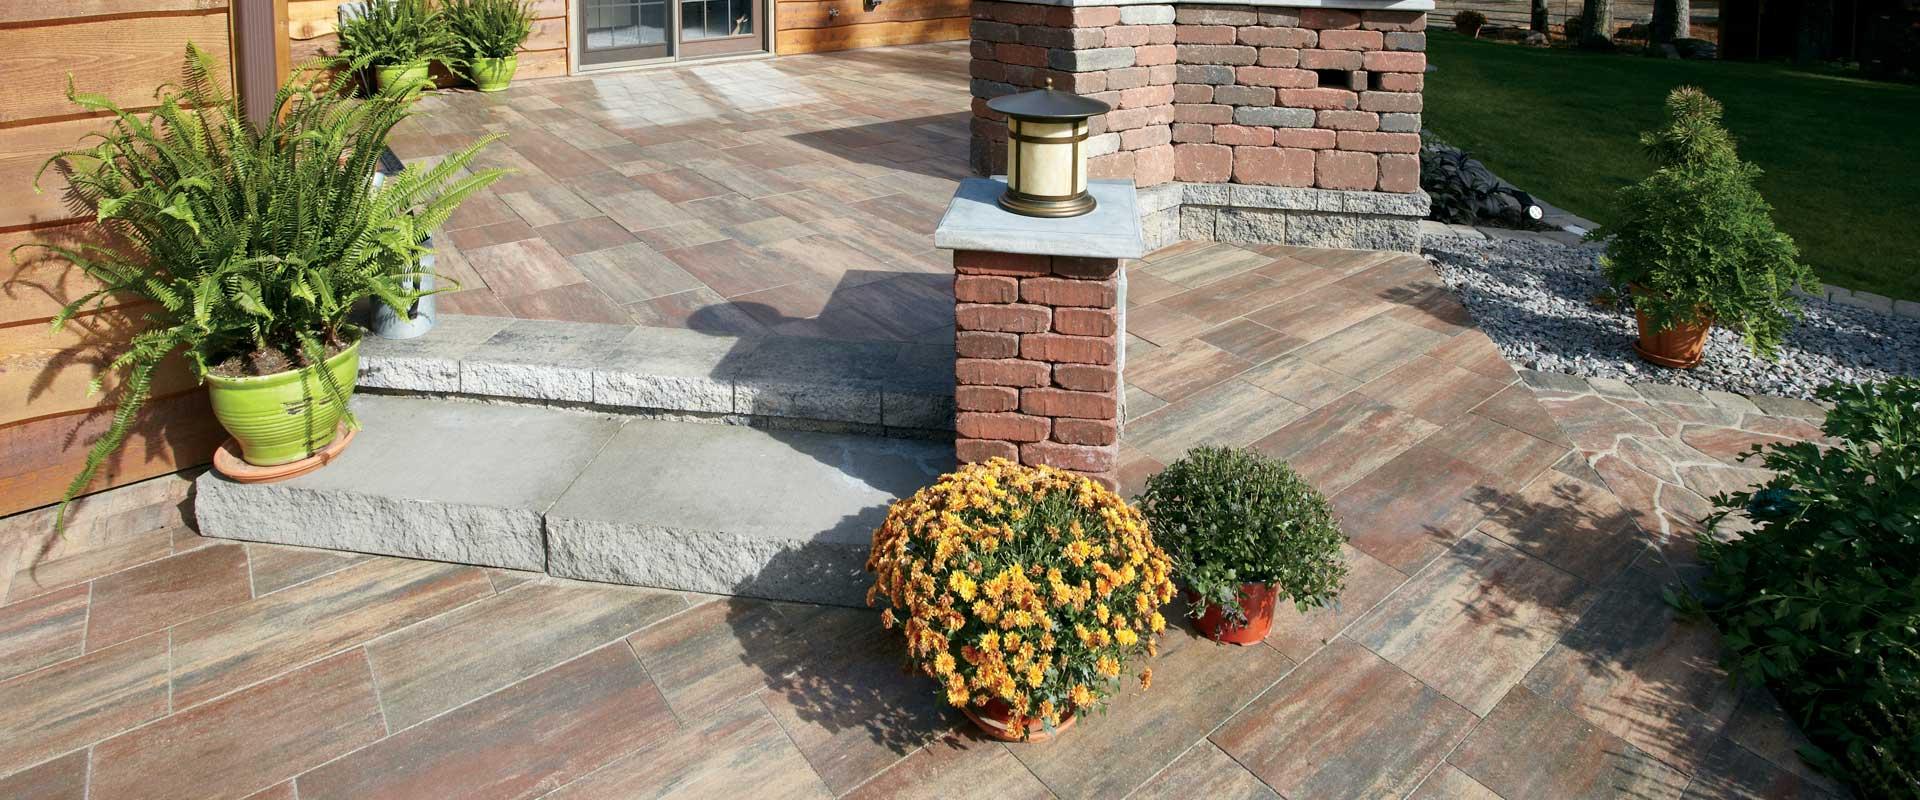 pavers u0026 patio stones TLCOACO